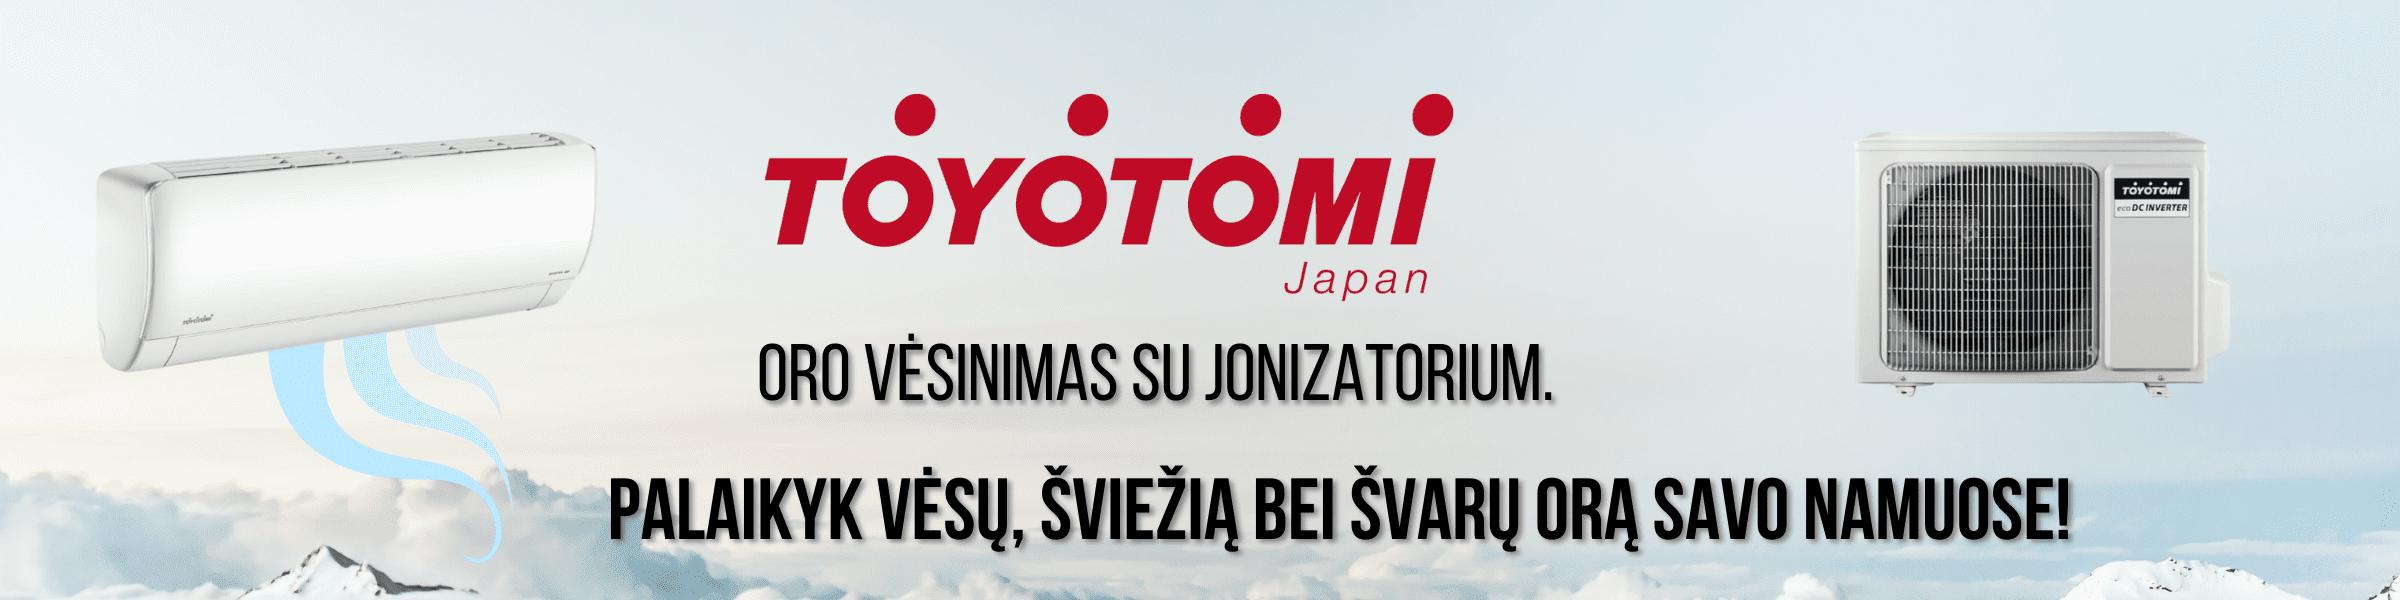 Toyotomi baneris